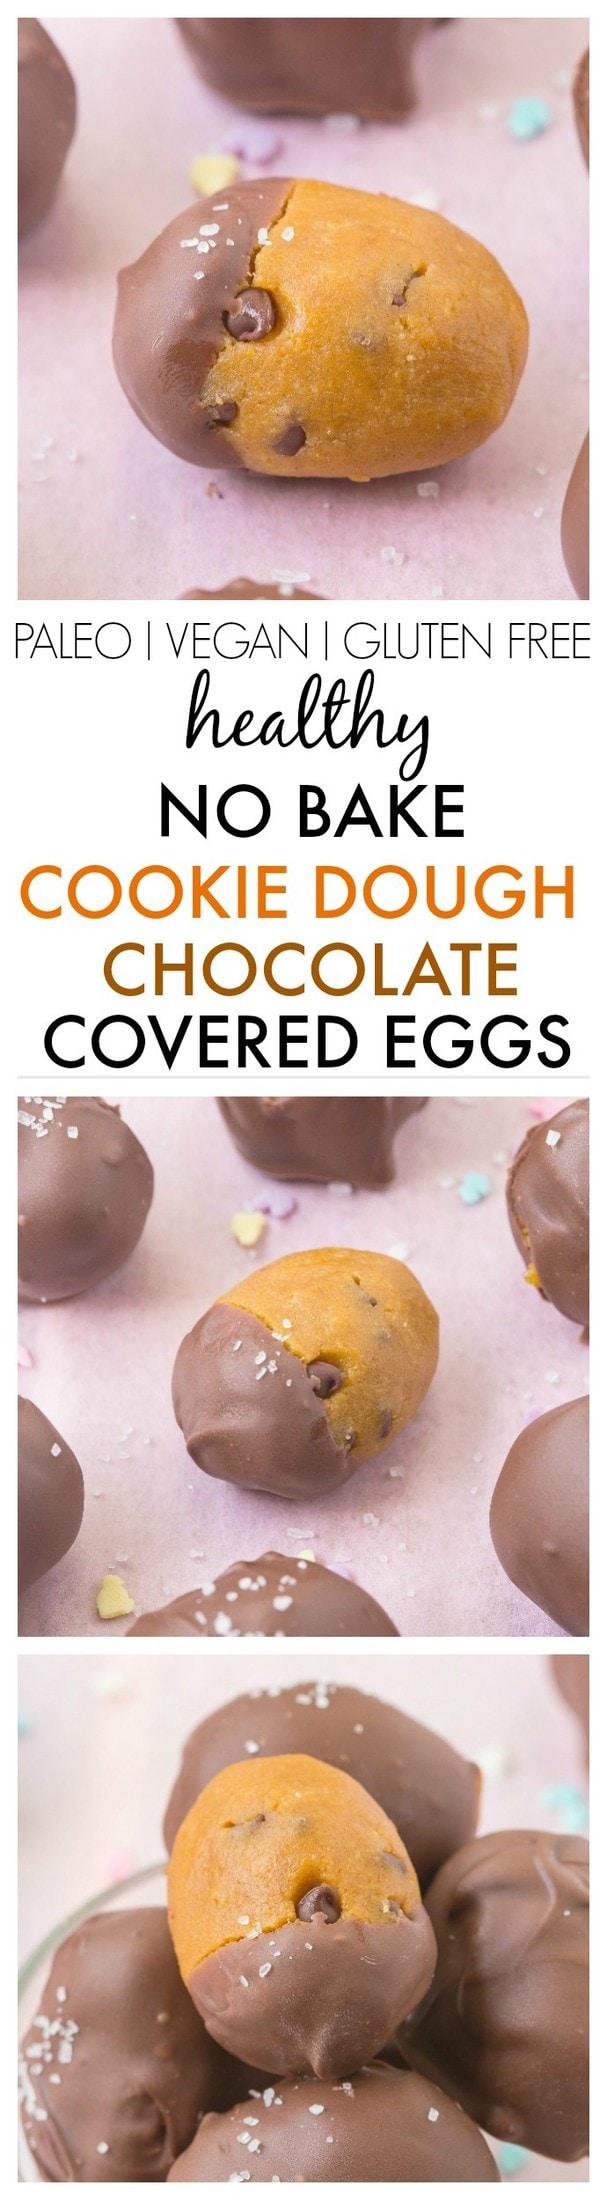 Healthy No Bake Cookie Dough Chocolate Covered Eggs- Accidentally healthy and SO easy- A fudgy cookie dough centre and a chocolate coating- NO butter, sugar or grains! {vegan, gluten free, paleo recipe}- thebigmansworld.com